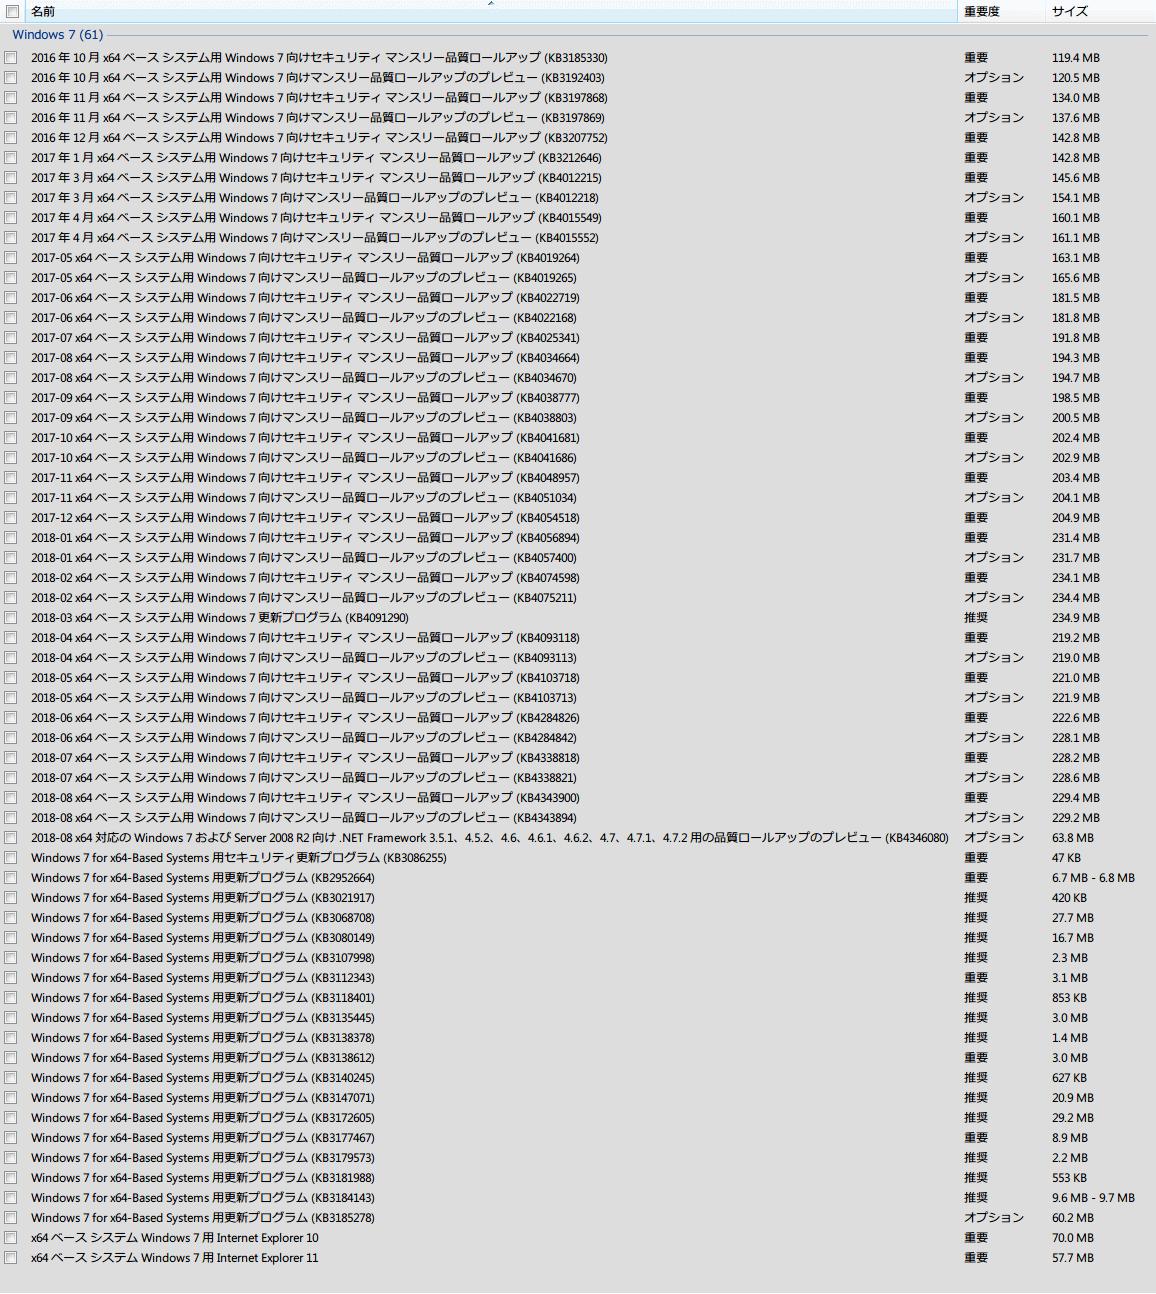 Windows 7 64bit Windows Update 2018年8月分まで非表示にした更新プログラムリスト